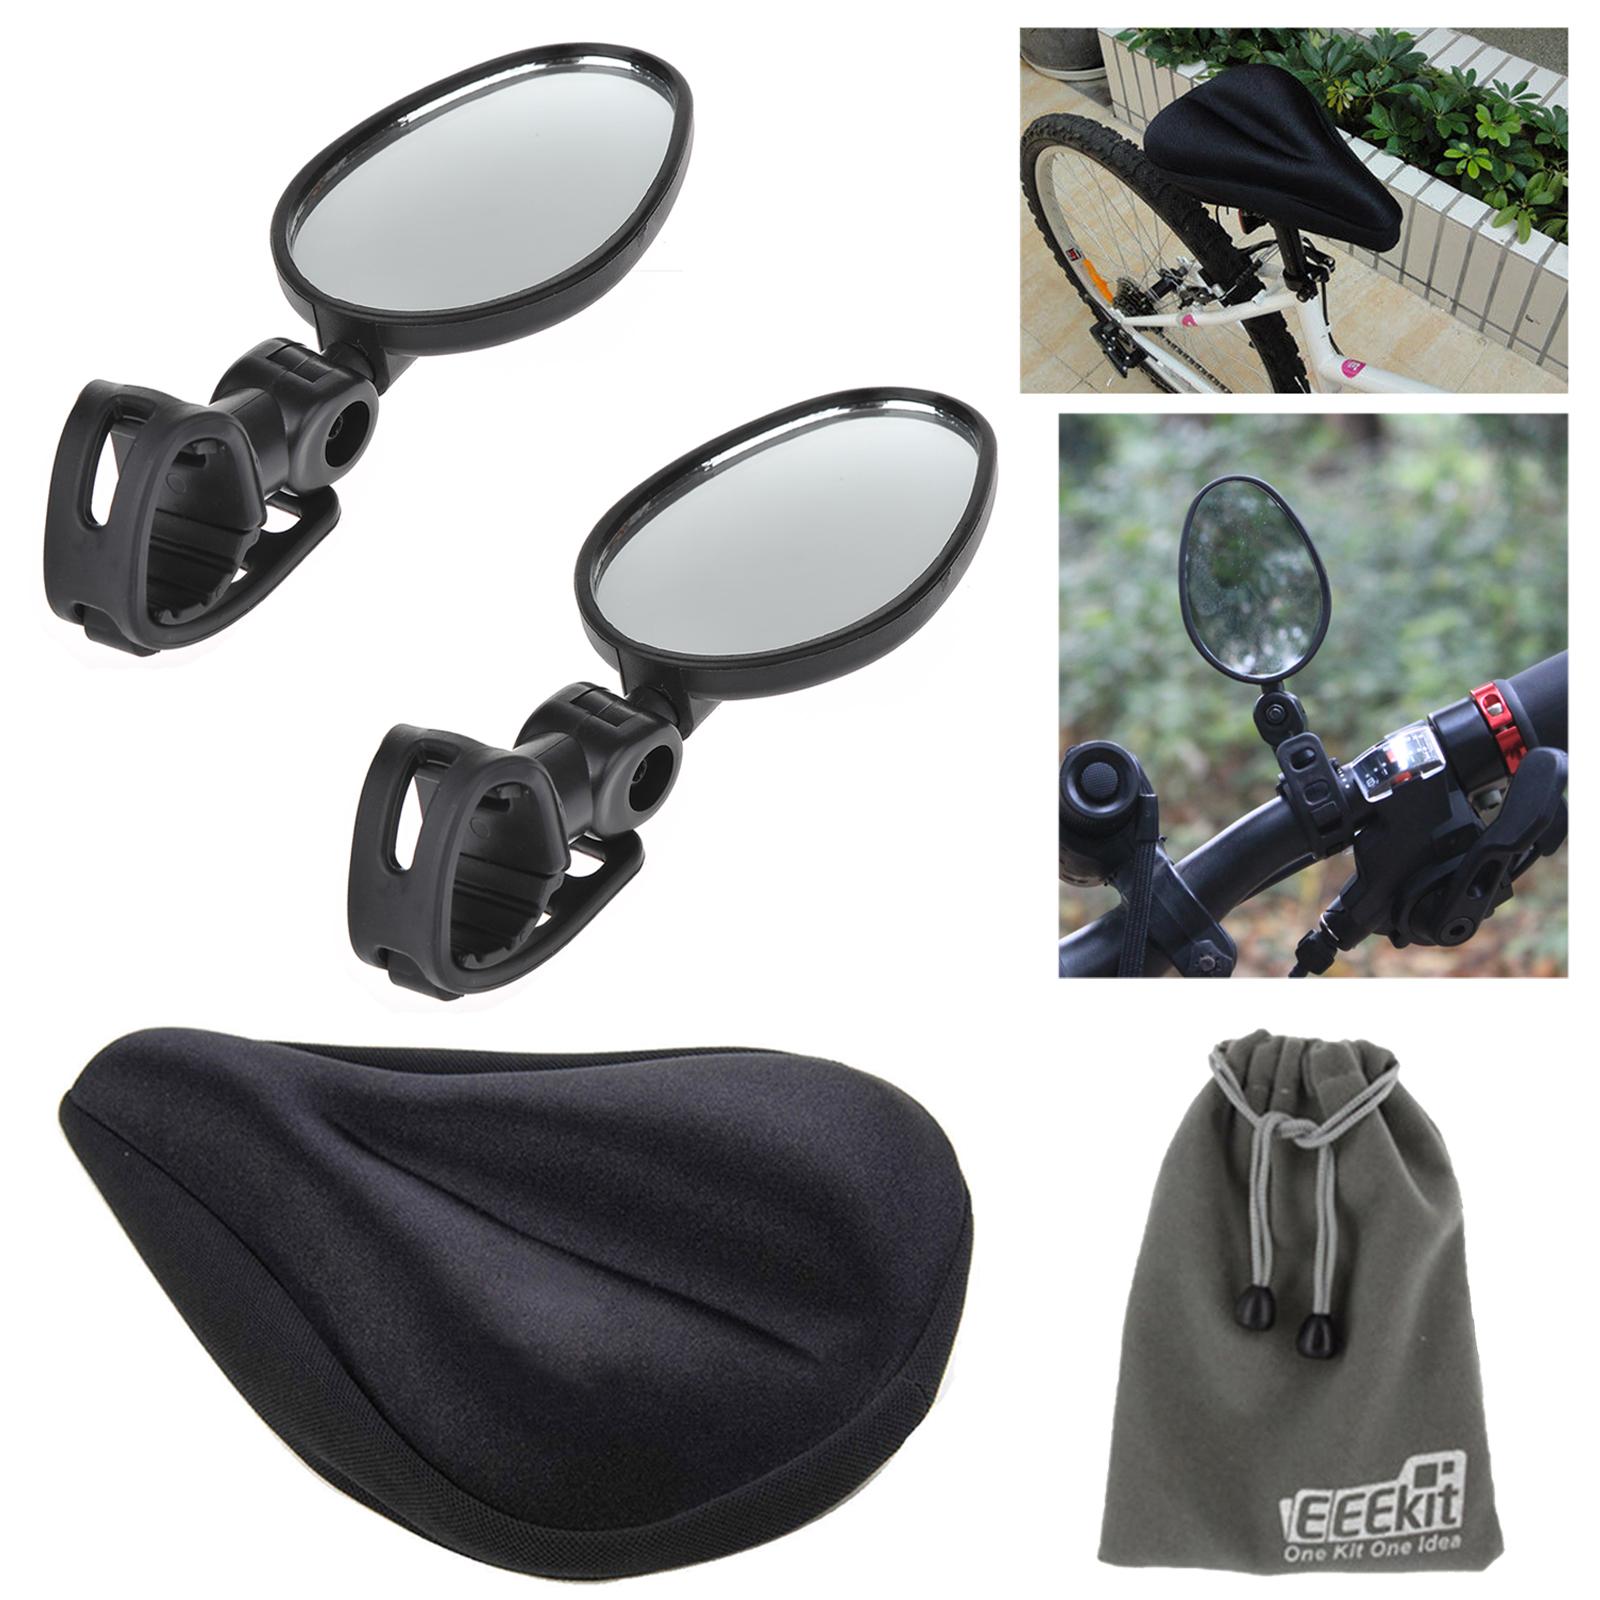 EEEKit 2in1 for Mountain Bike Bicycle Cycling, Mini Rotaty Rearview Handlebar Glass Mirror+Bike Saddle Cover Gel Seat